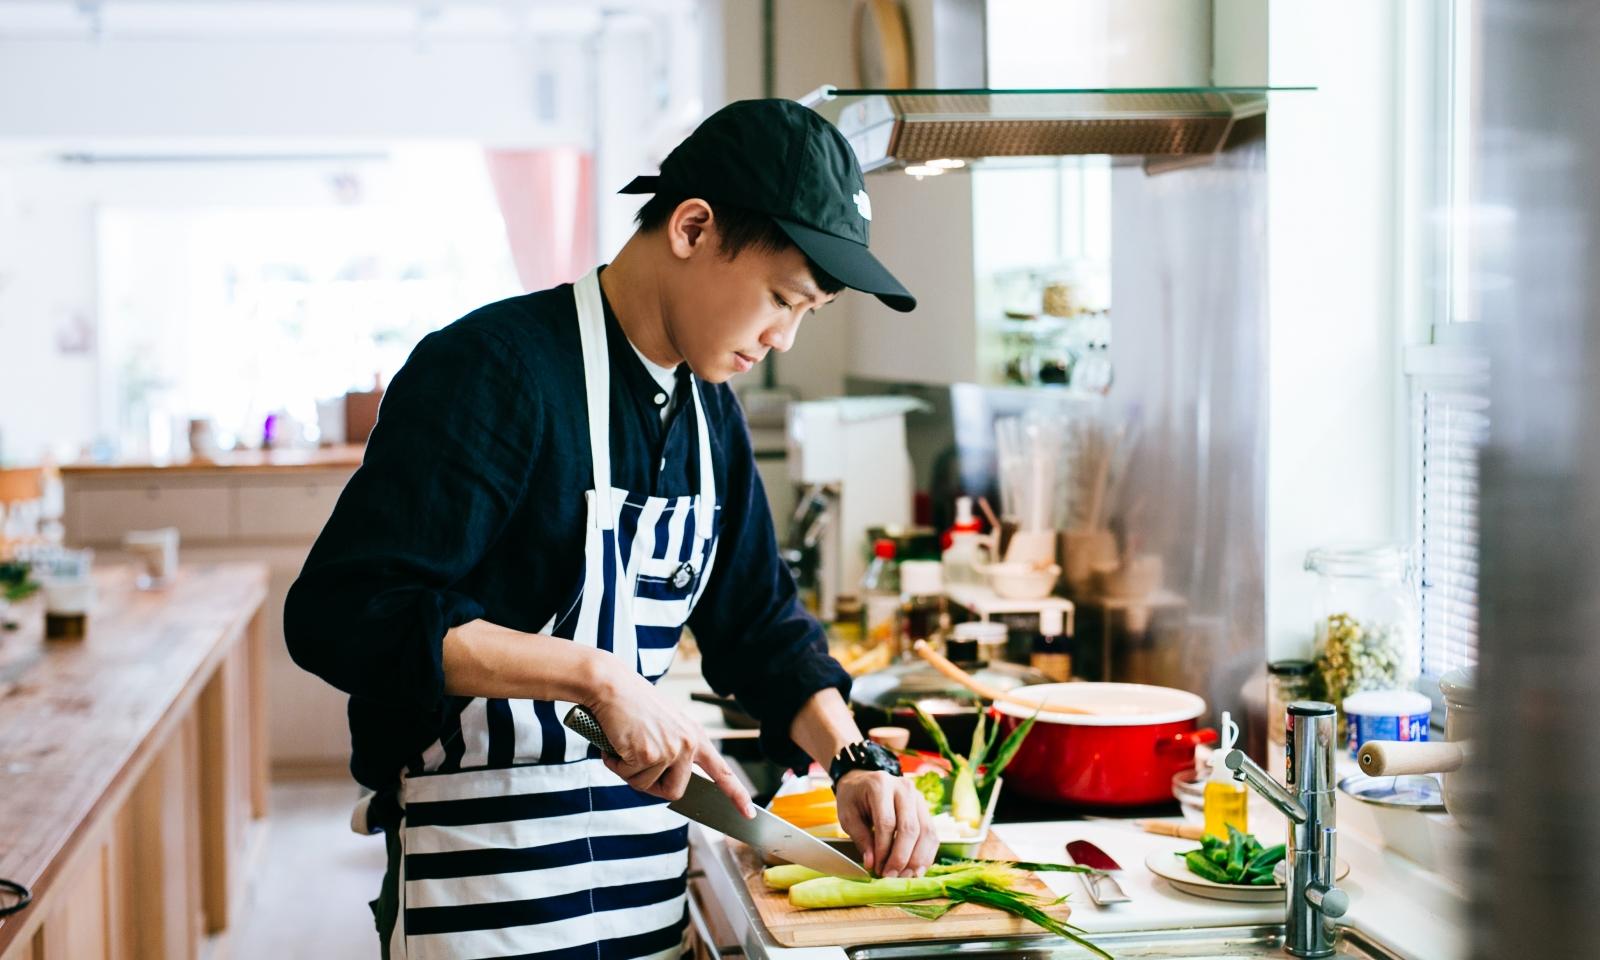 7 a.m. to 9 a.m.  不務正業男子 Ayo:煮一桌慰勞熬夜身心的早餐